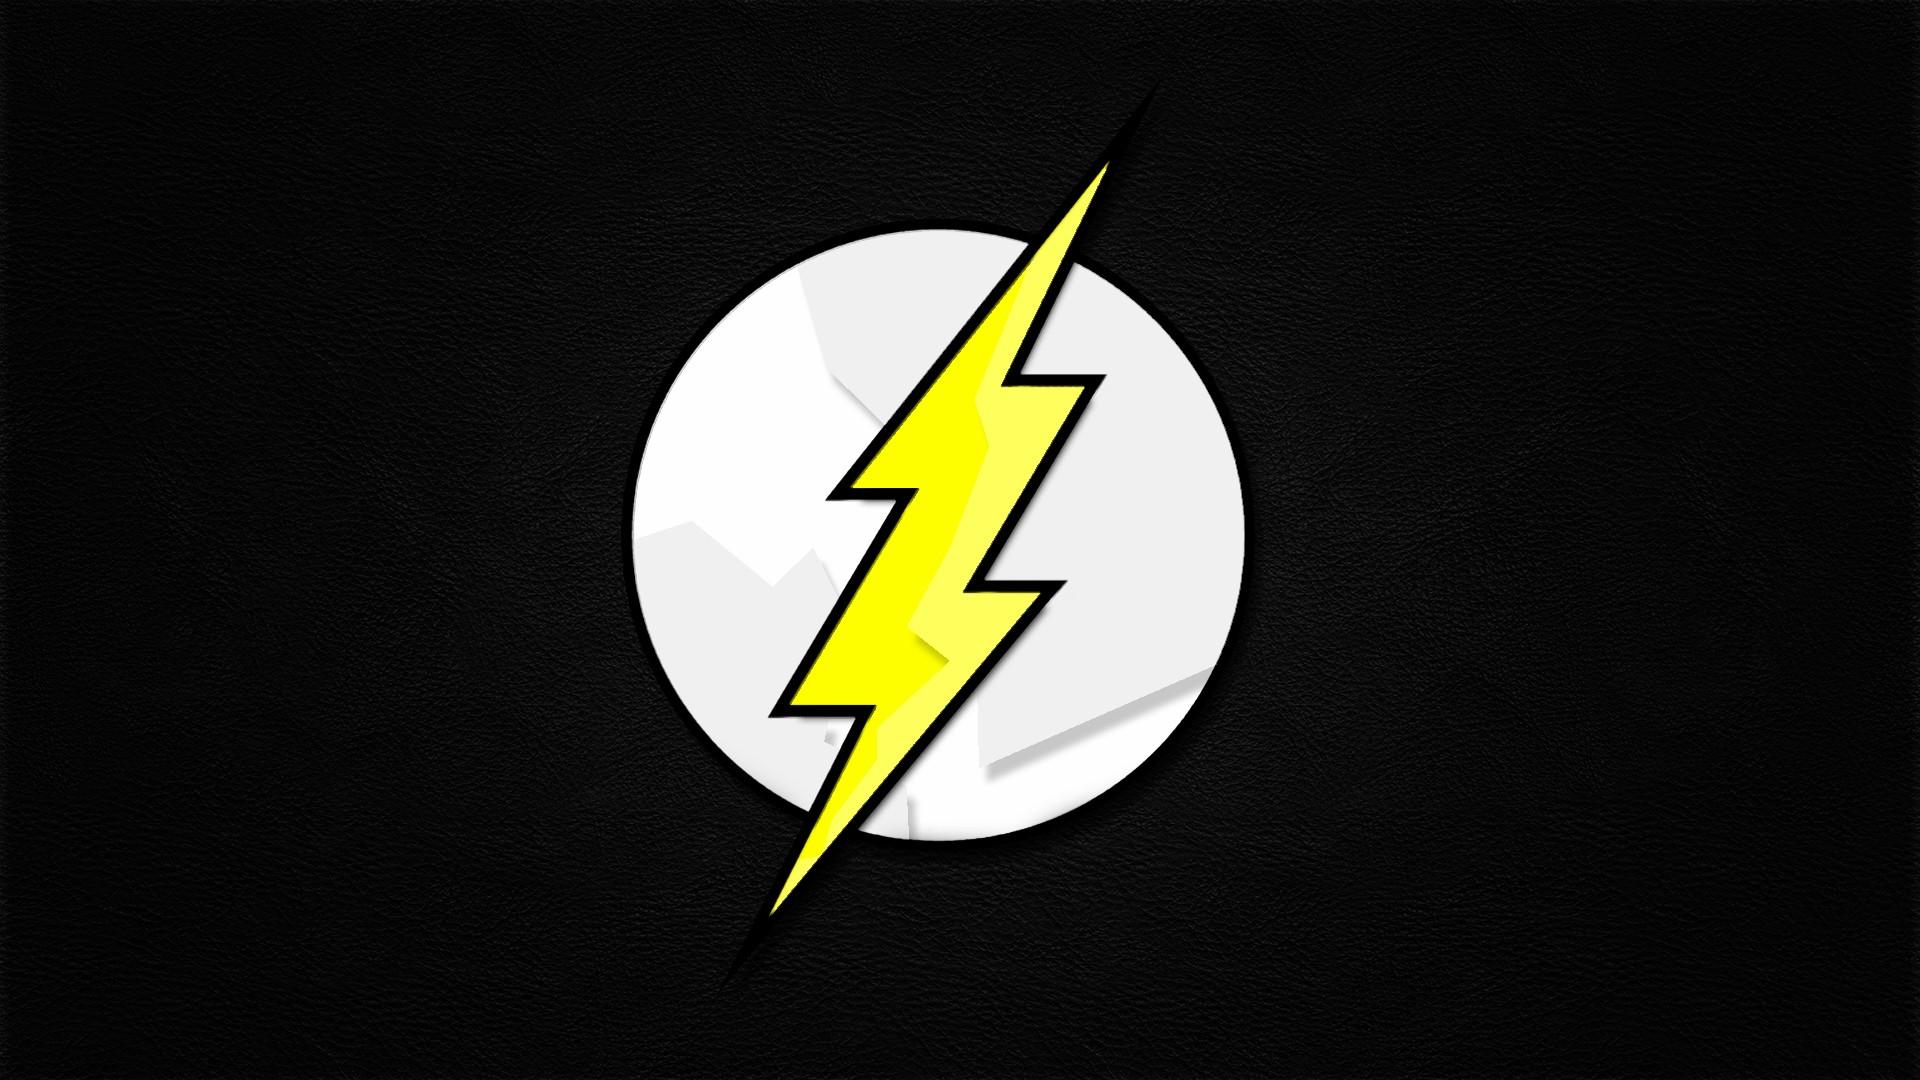 Superhero Logos 1920x1080